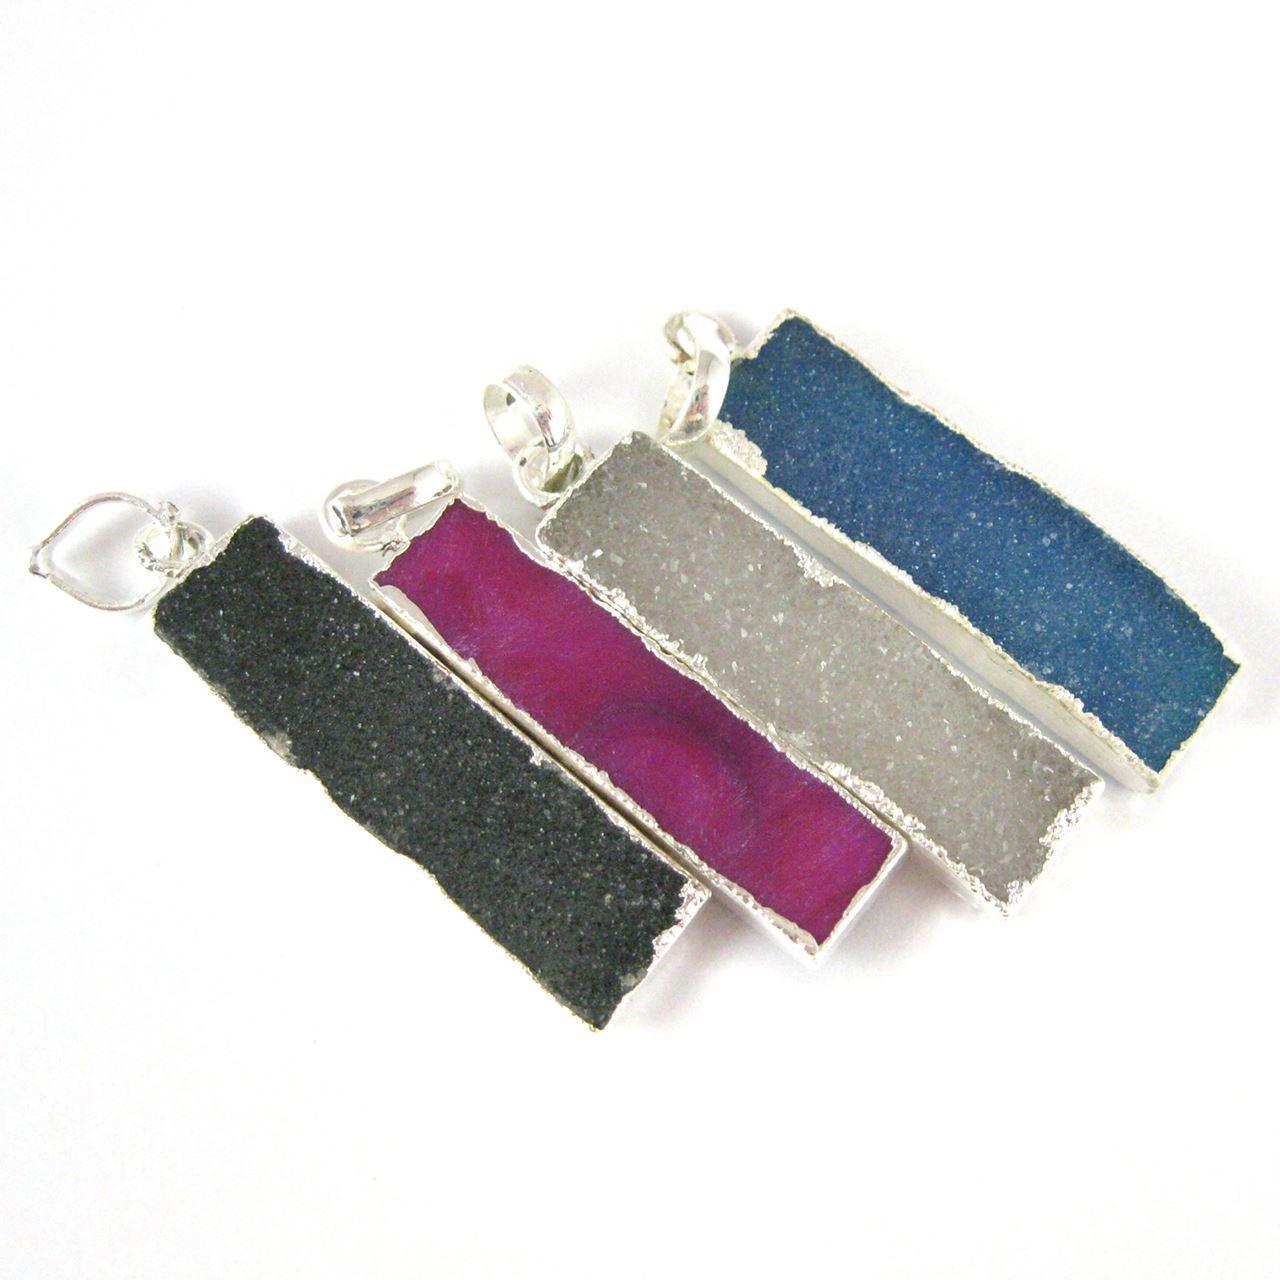 Natural Druzy Agate Bar Pendant, Silver dipped Long Vertical Bar-Grey